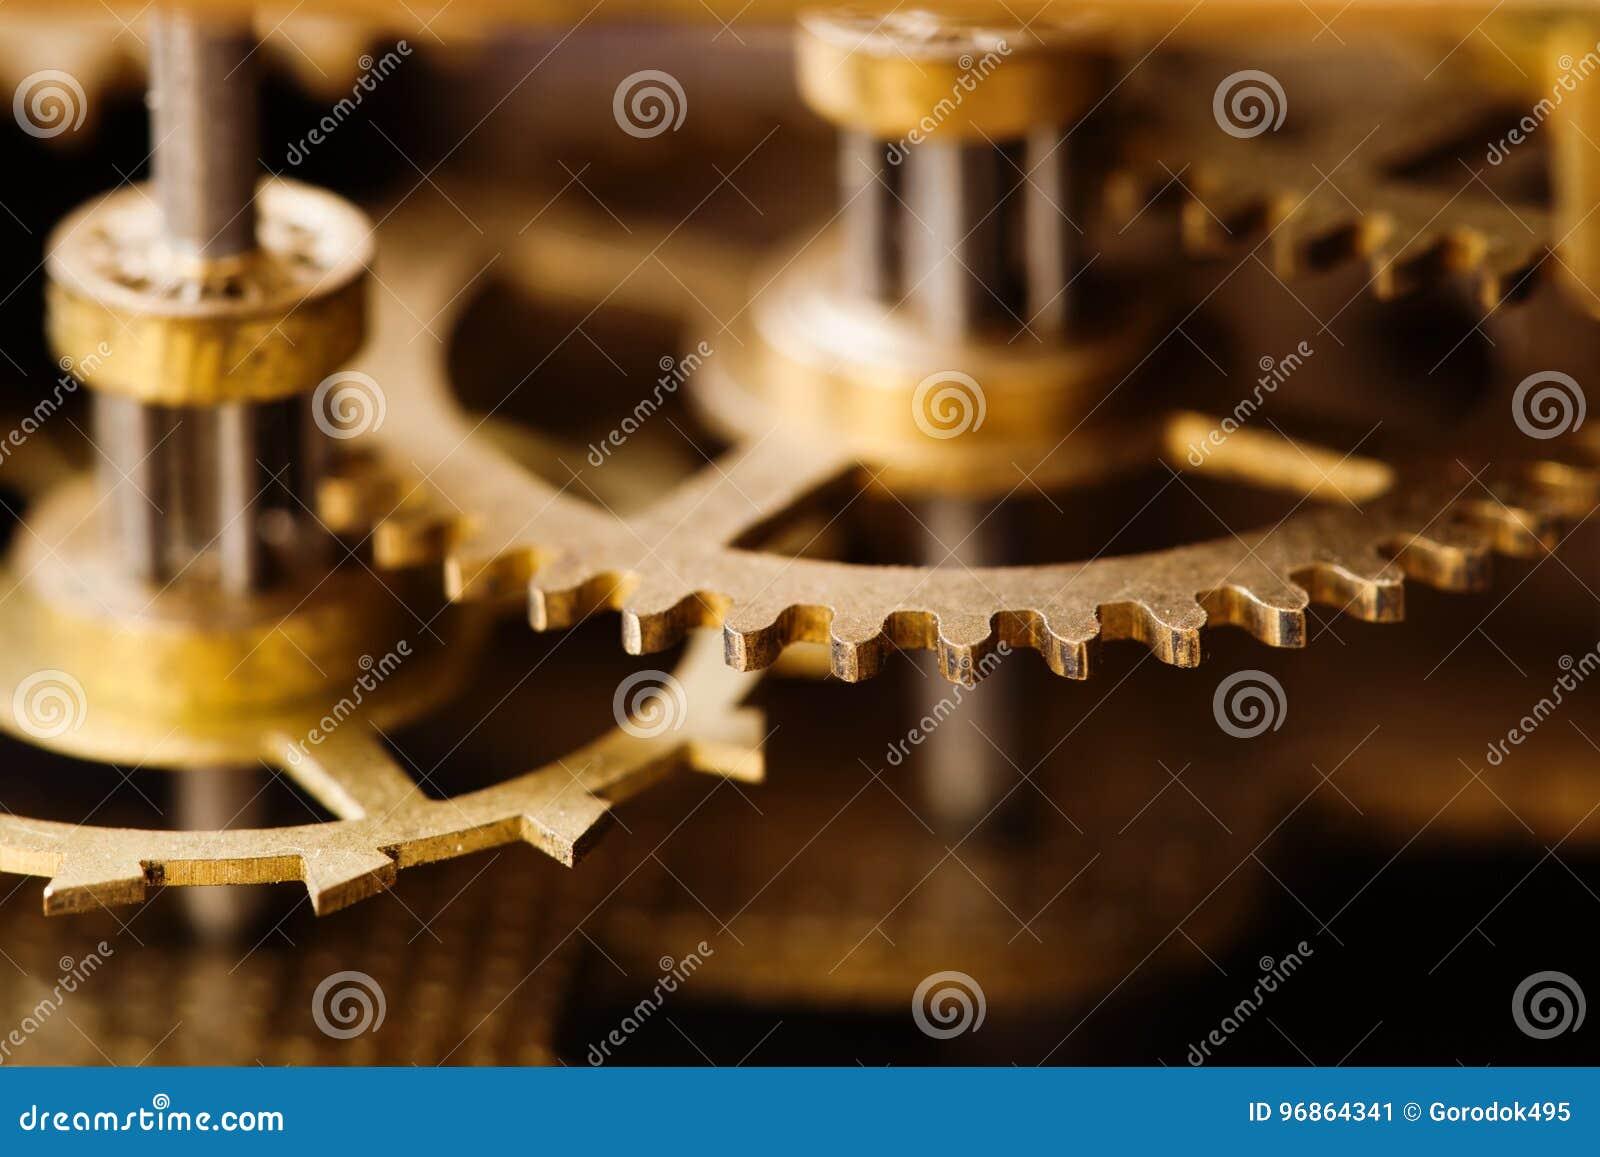 Industrial machinery bronze cog transmission macro view. Aged metal gear wheel teeth mechanism, shallow depth field